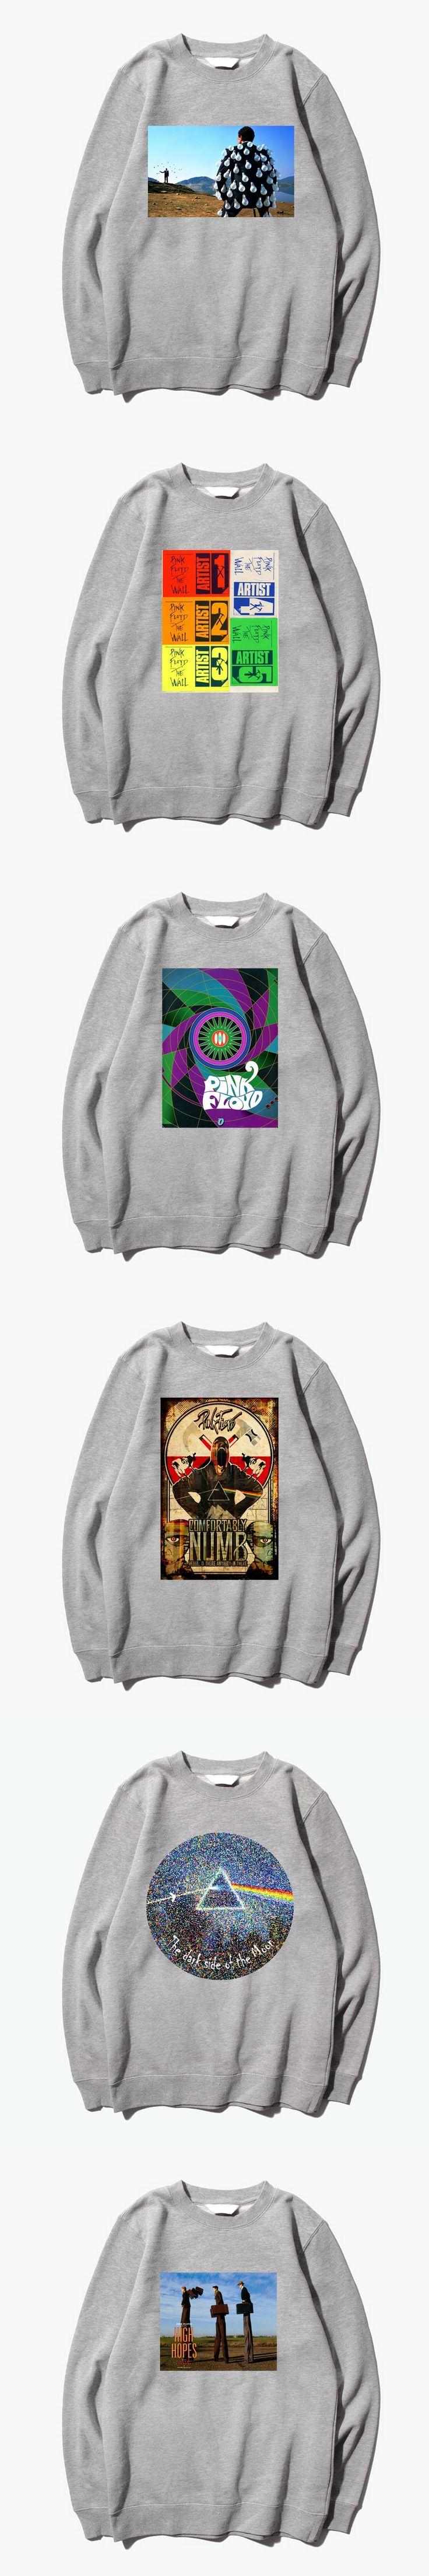 High Hopes pink floyd psychedelic rock vintage fashion Hoodies Sweatshirts